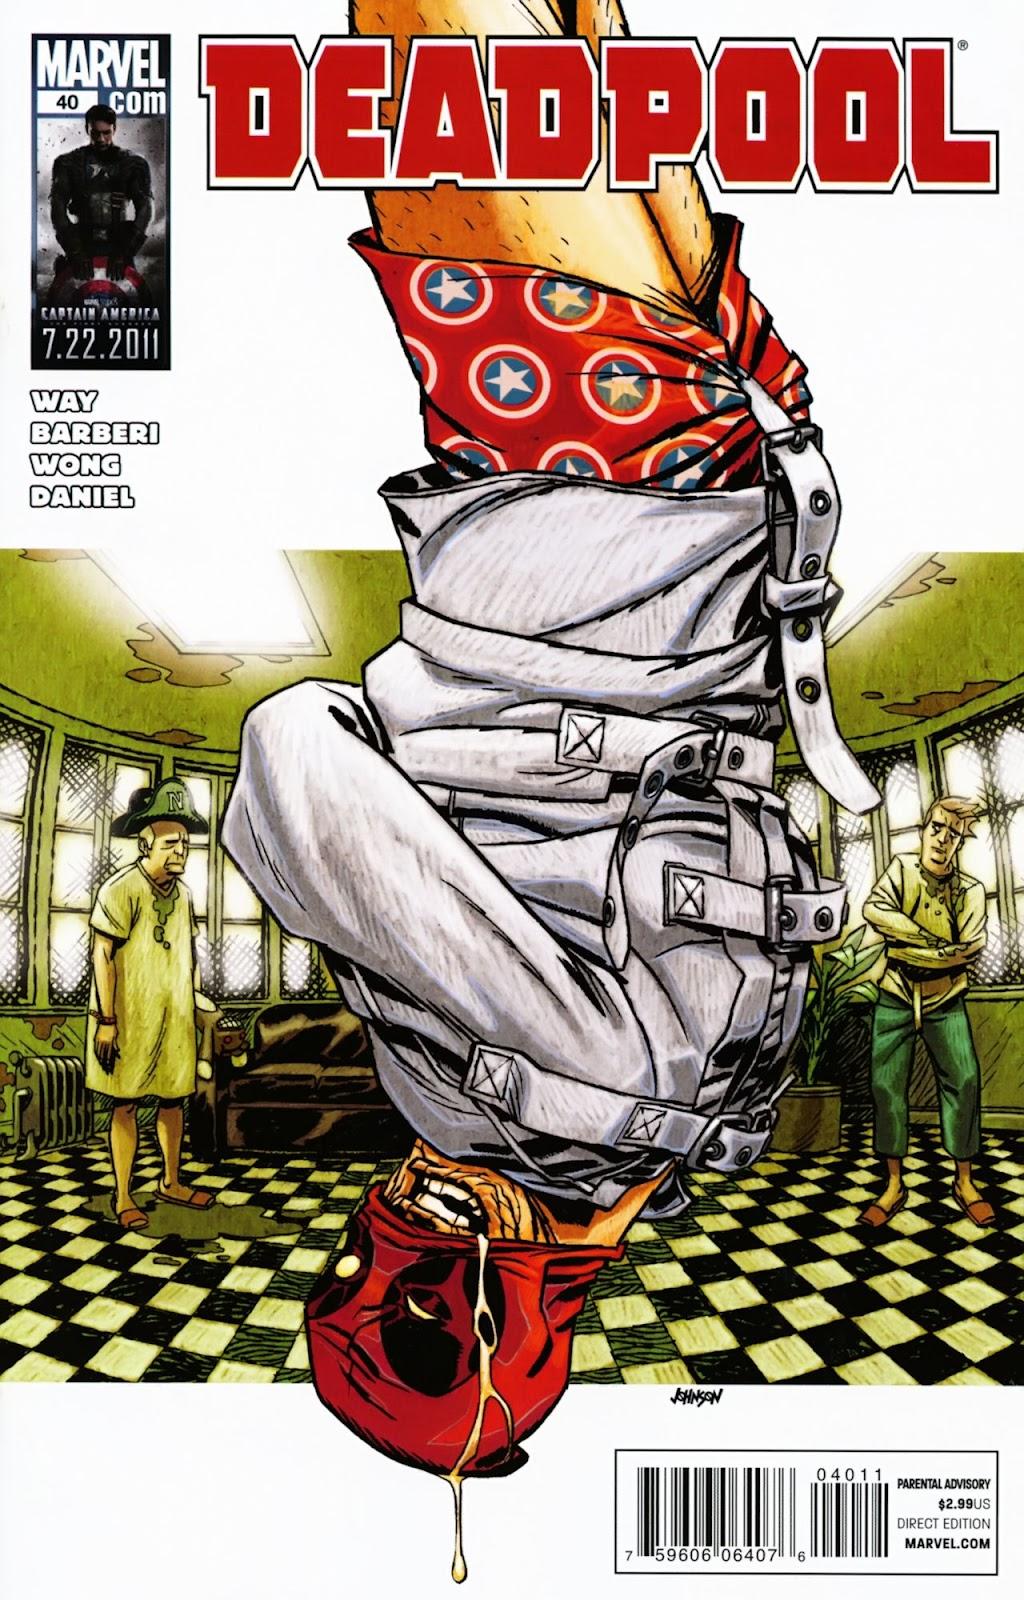 Read online Deadpool (2008) comic -  Issue #40 - 1